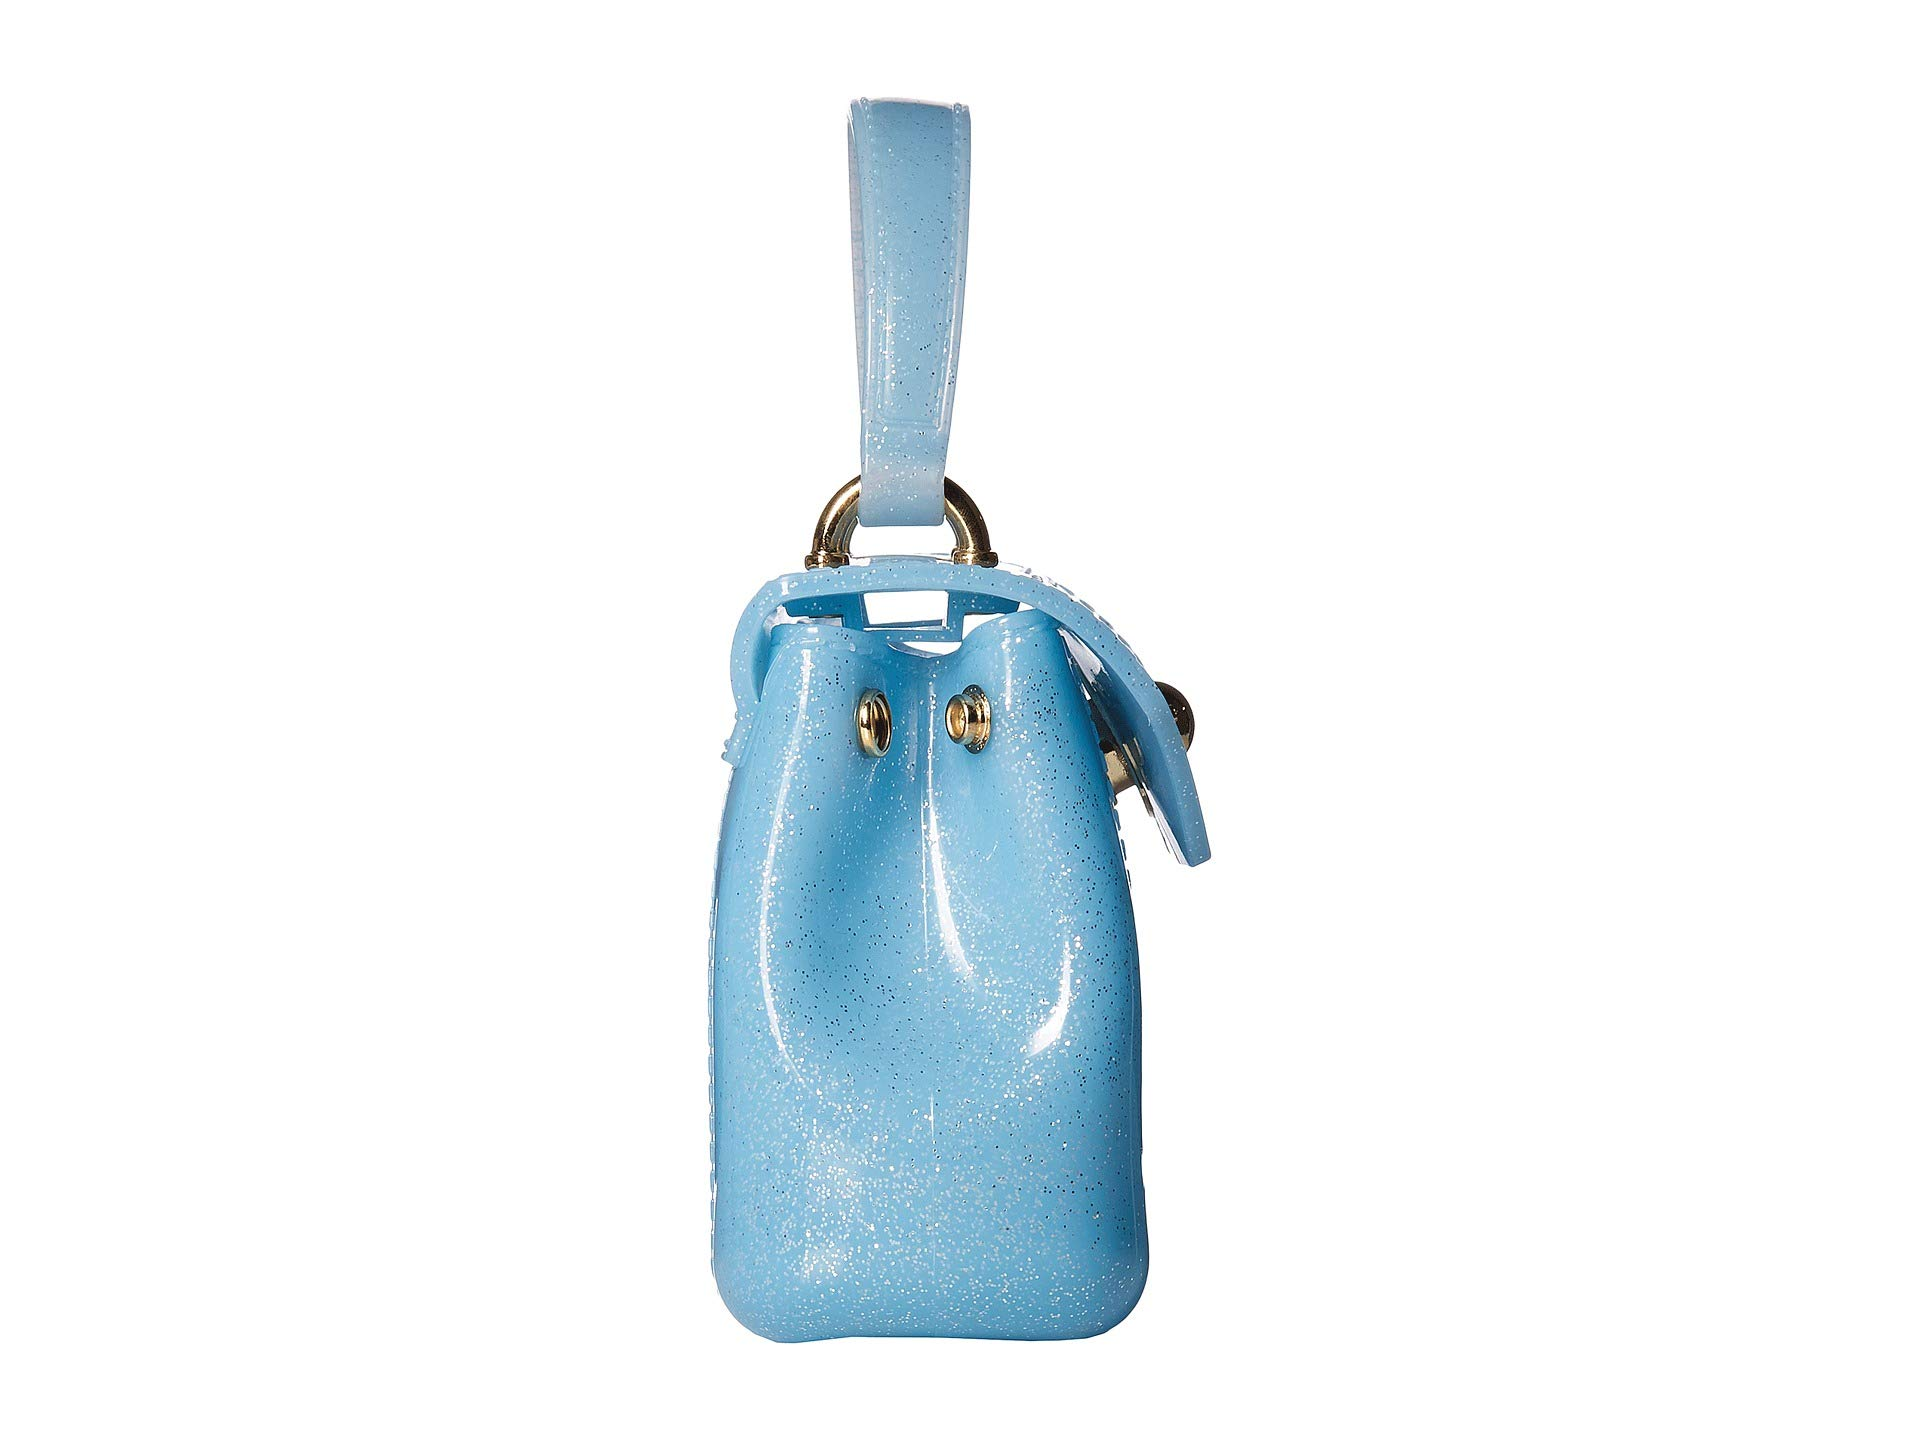 Amiana Jelly Metallic h0003 3 Blue Ufw6gU